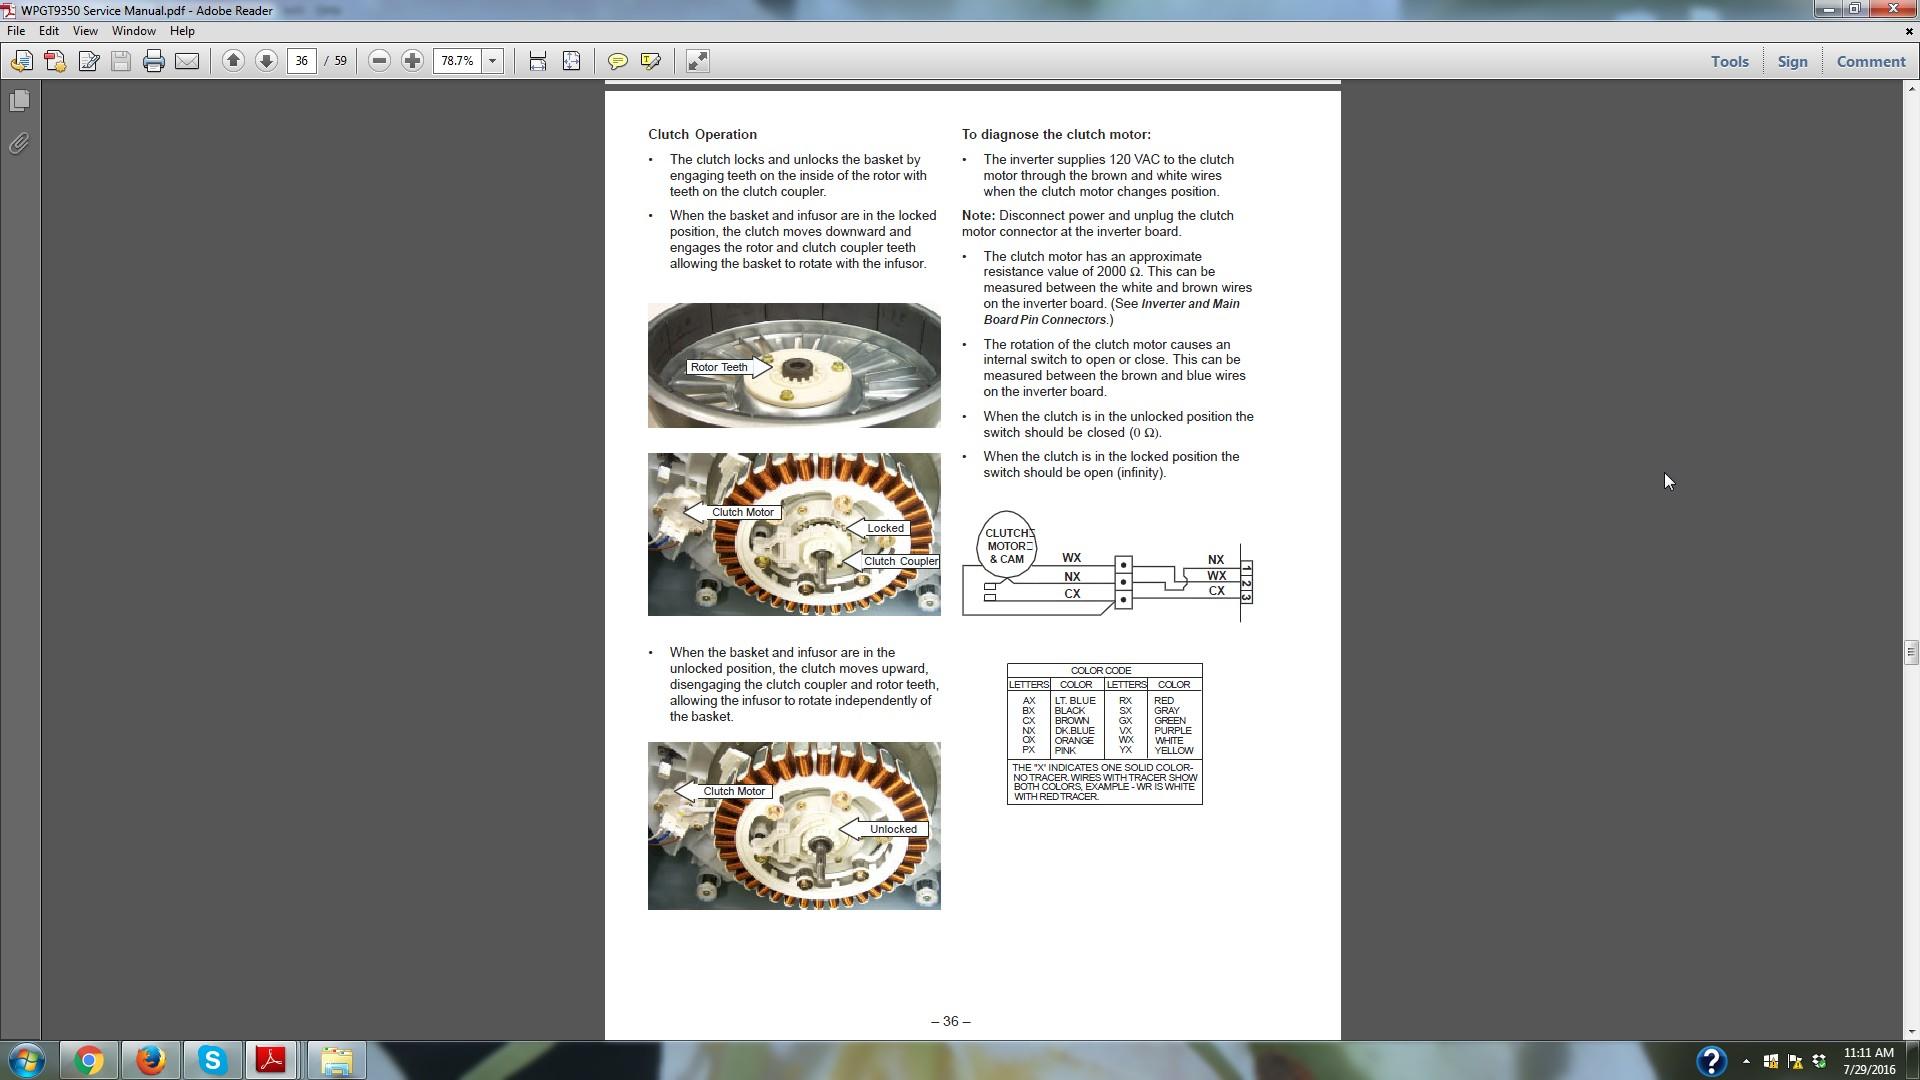 f4f5c396-17ac-4744-aead-c2e553ecc404_ScreenHunter_2626 Jul. 29 11.12.jpg